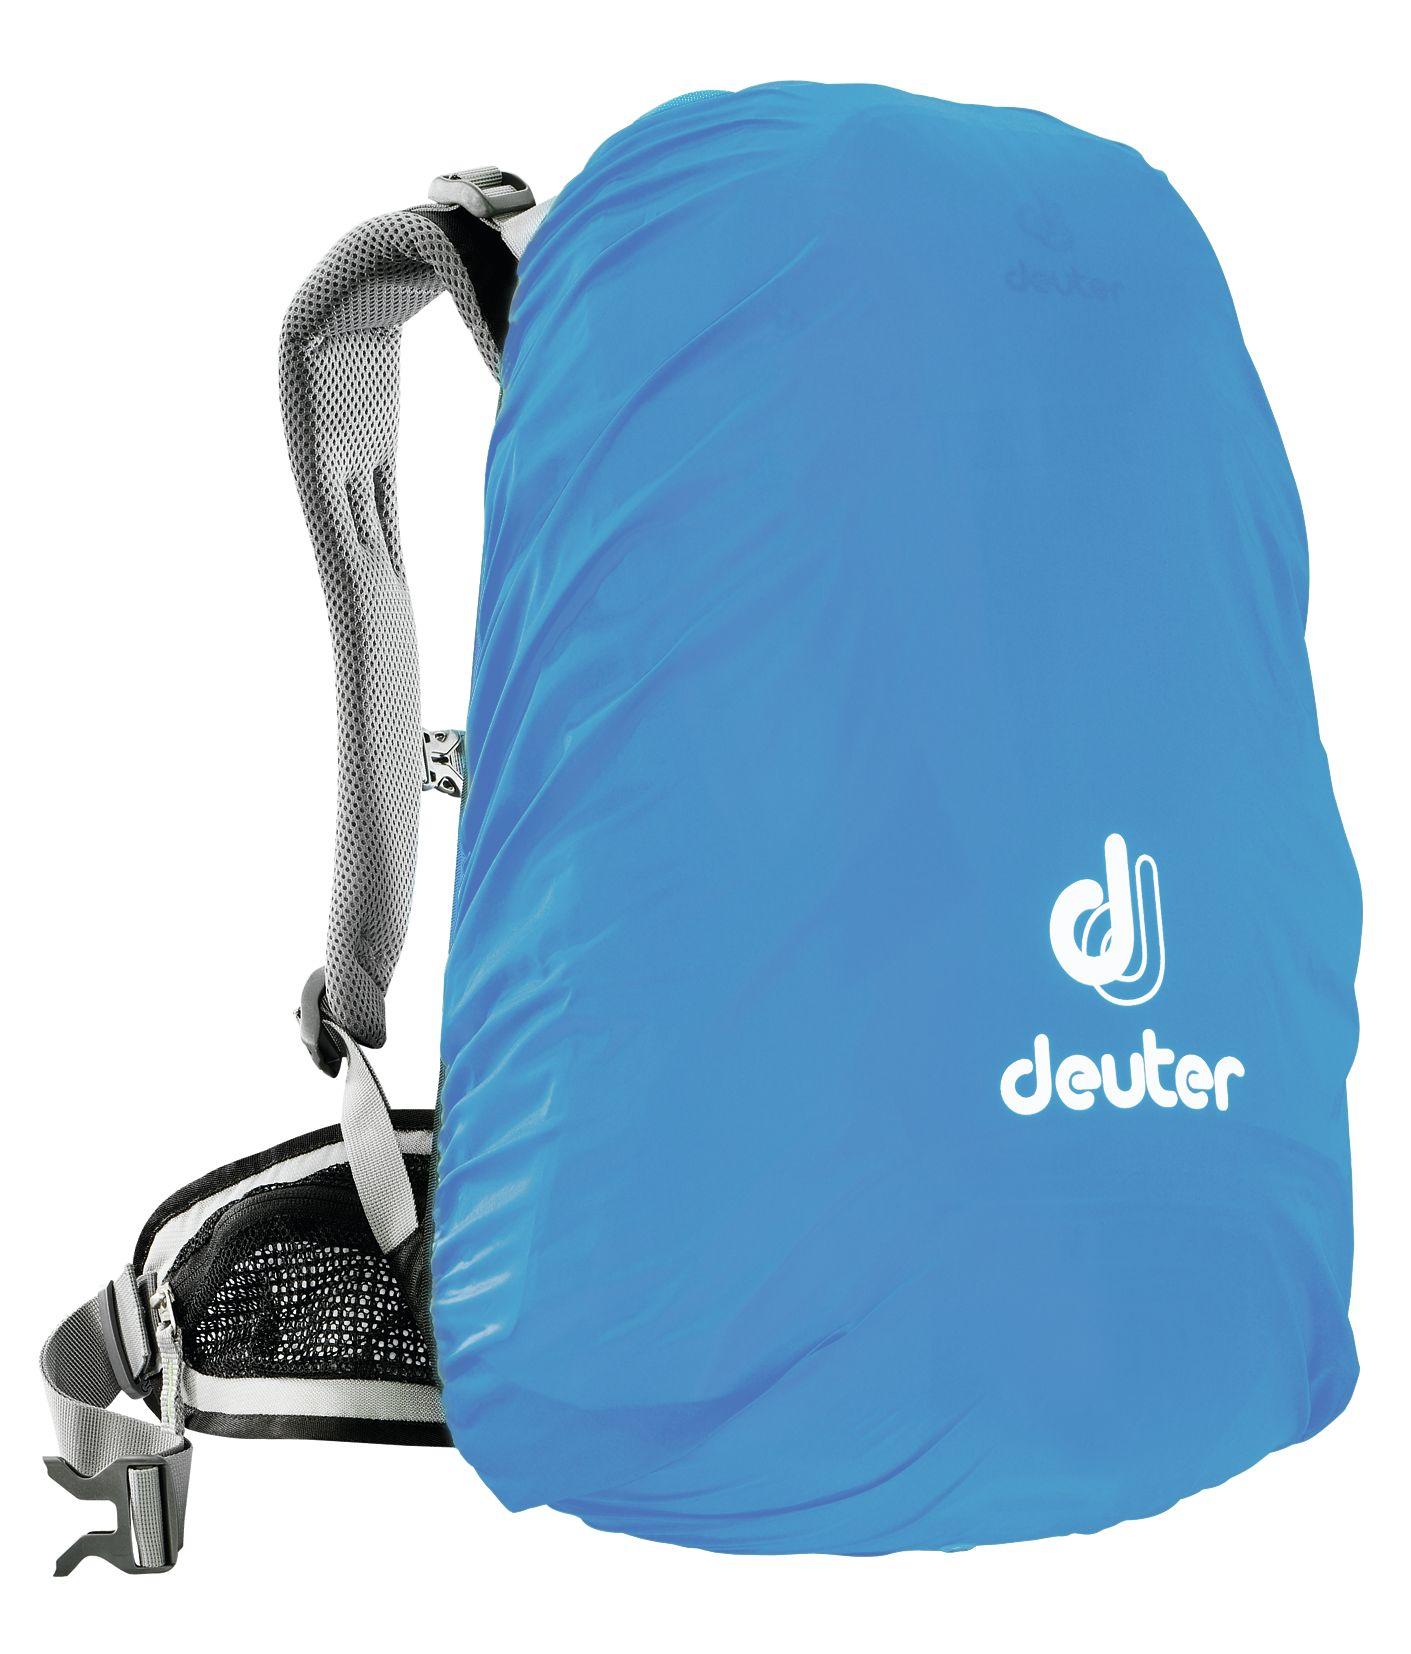 Deuter - Rain Cover 1 (20- Rain cover